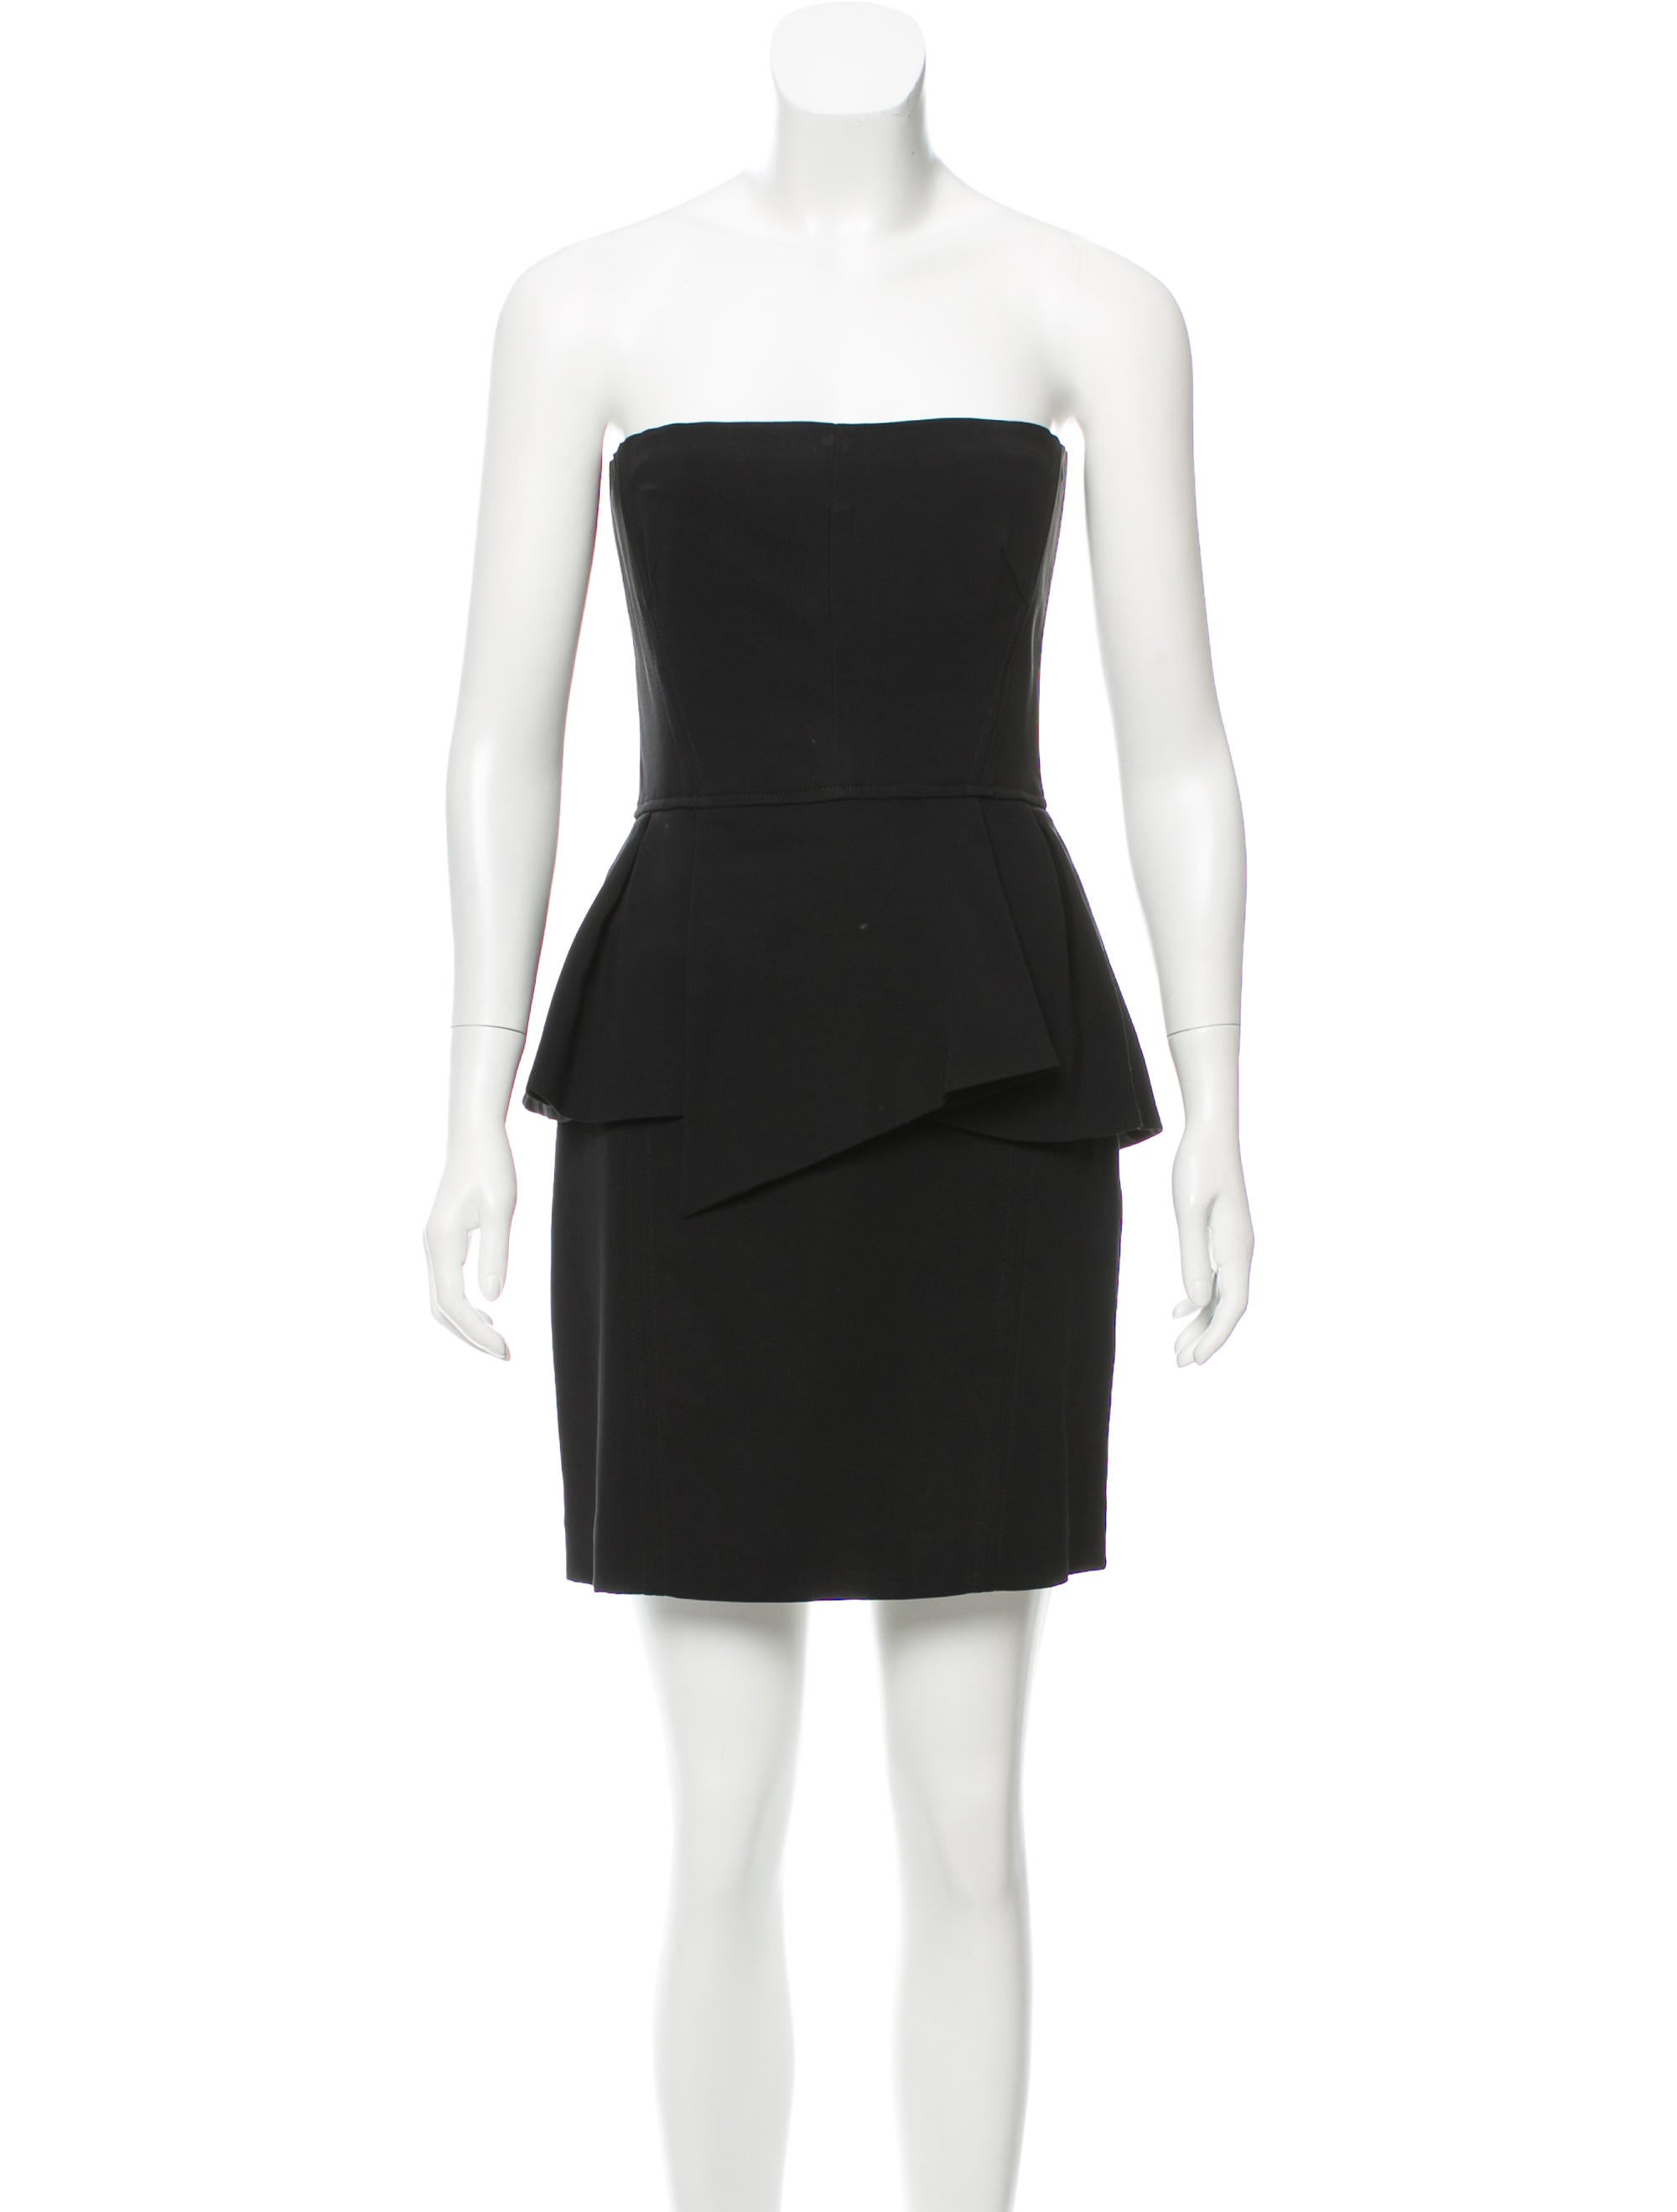 the kooples strapless peplum dress clothing wkoop20694